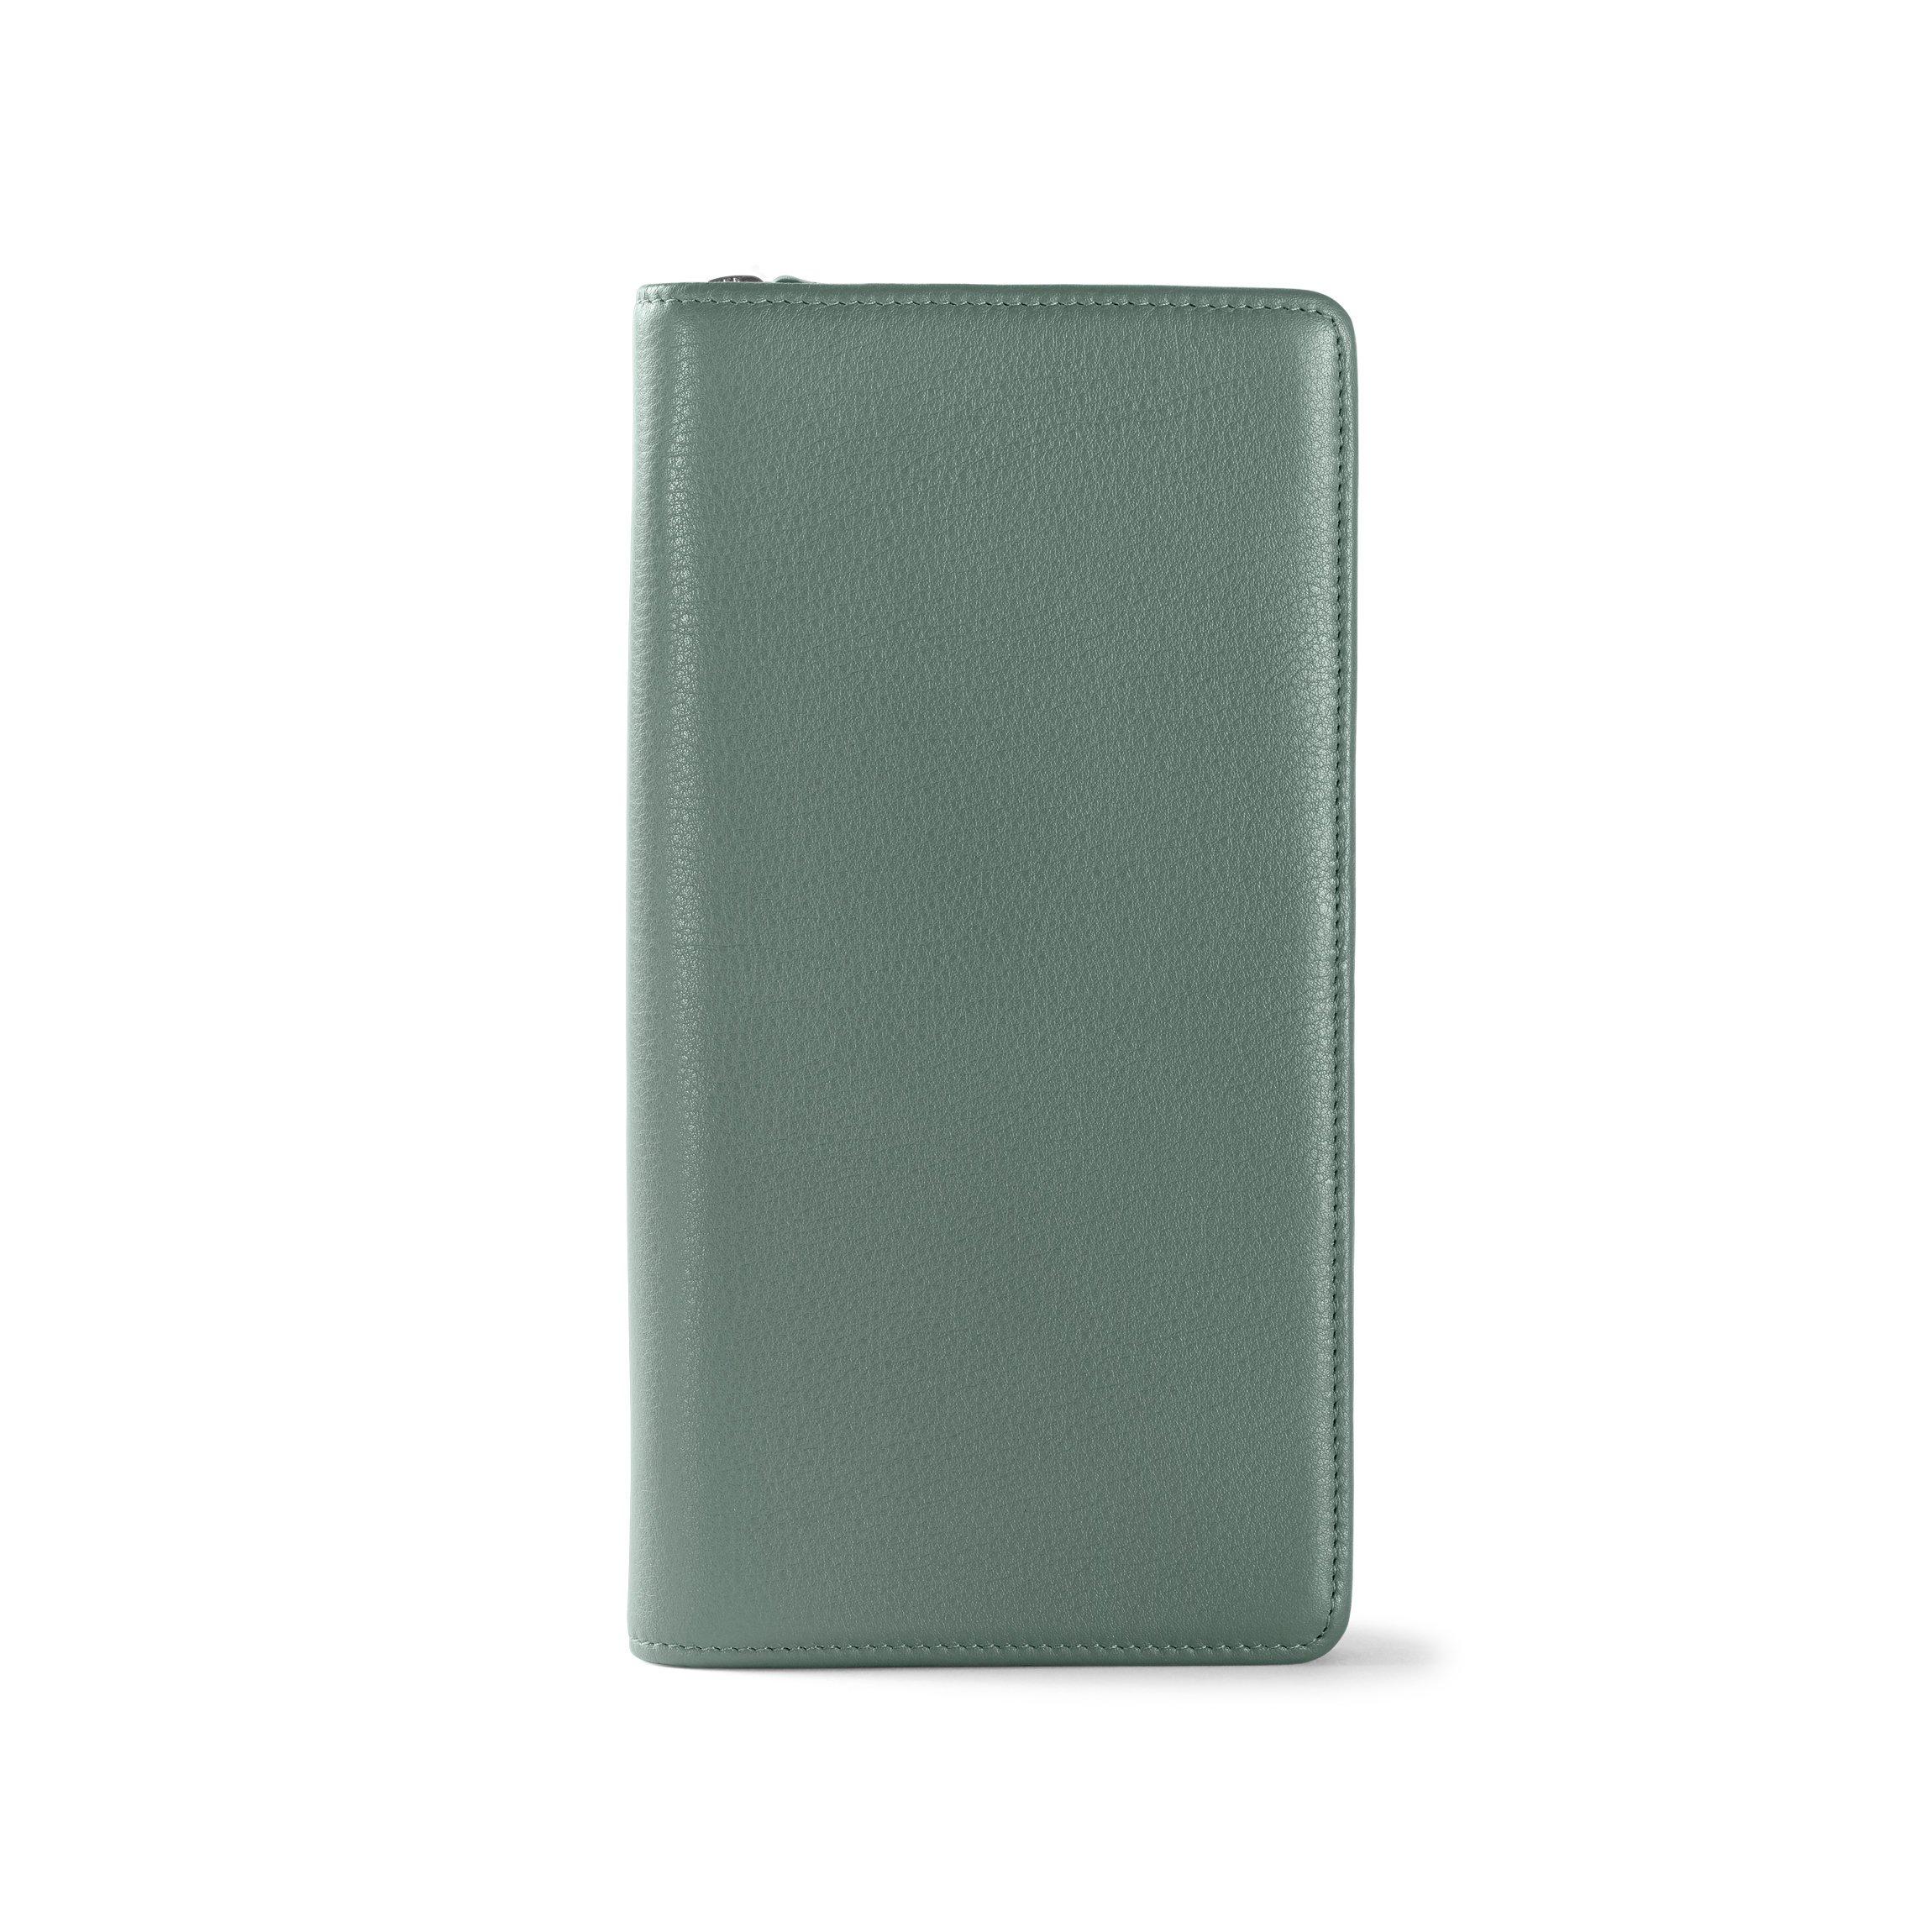 Zip Around Travel Wallet - Full Grain Leather Leather - Dusk (blue)